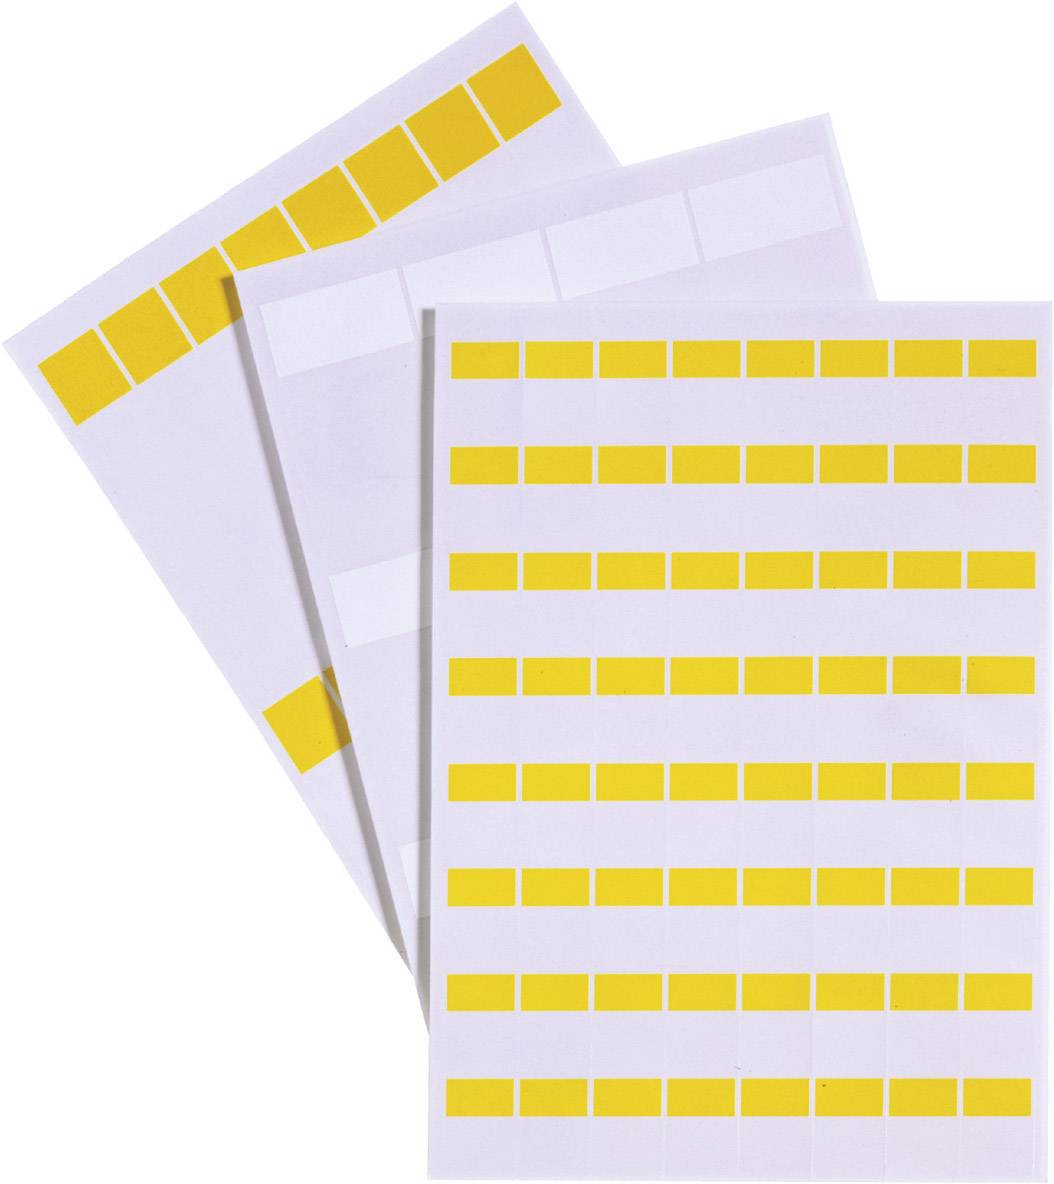 Etikety LappKabel LCK-32 WH (83256143), bílá